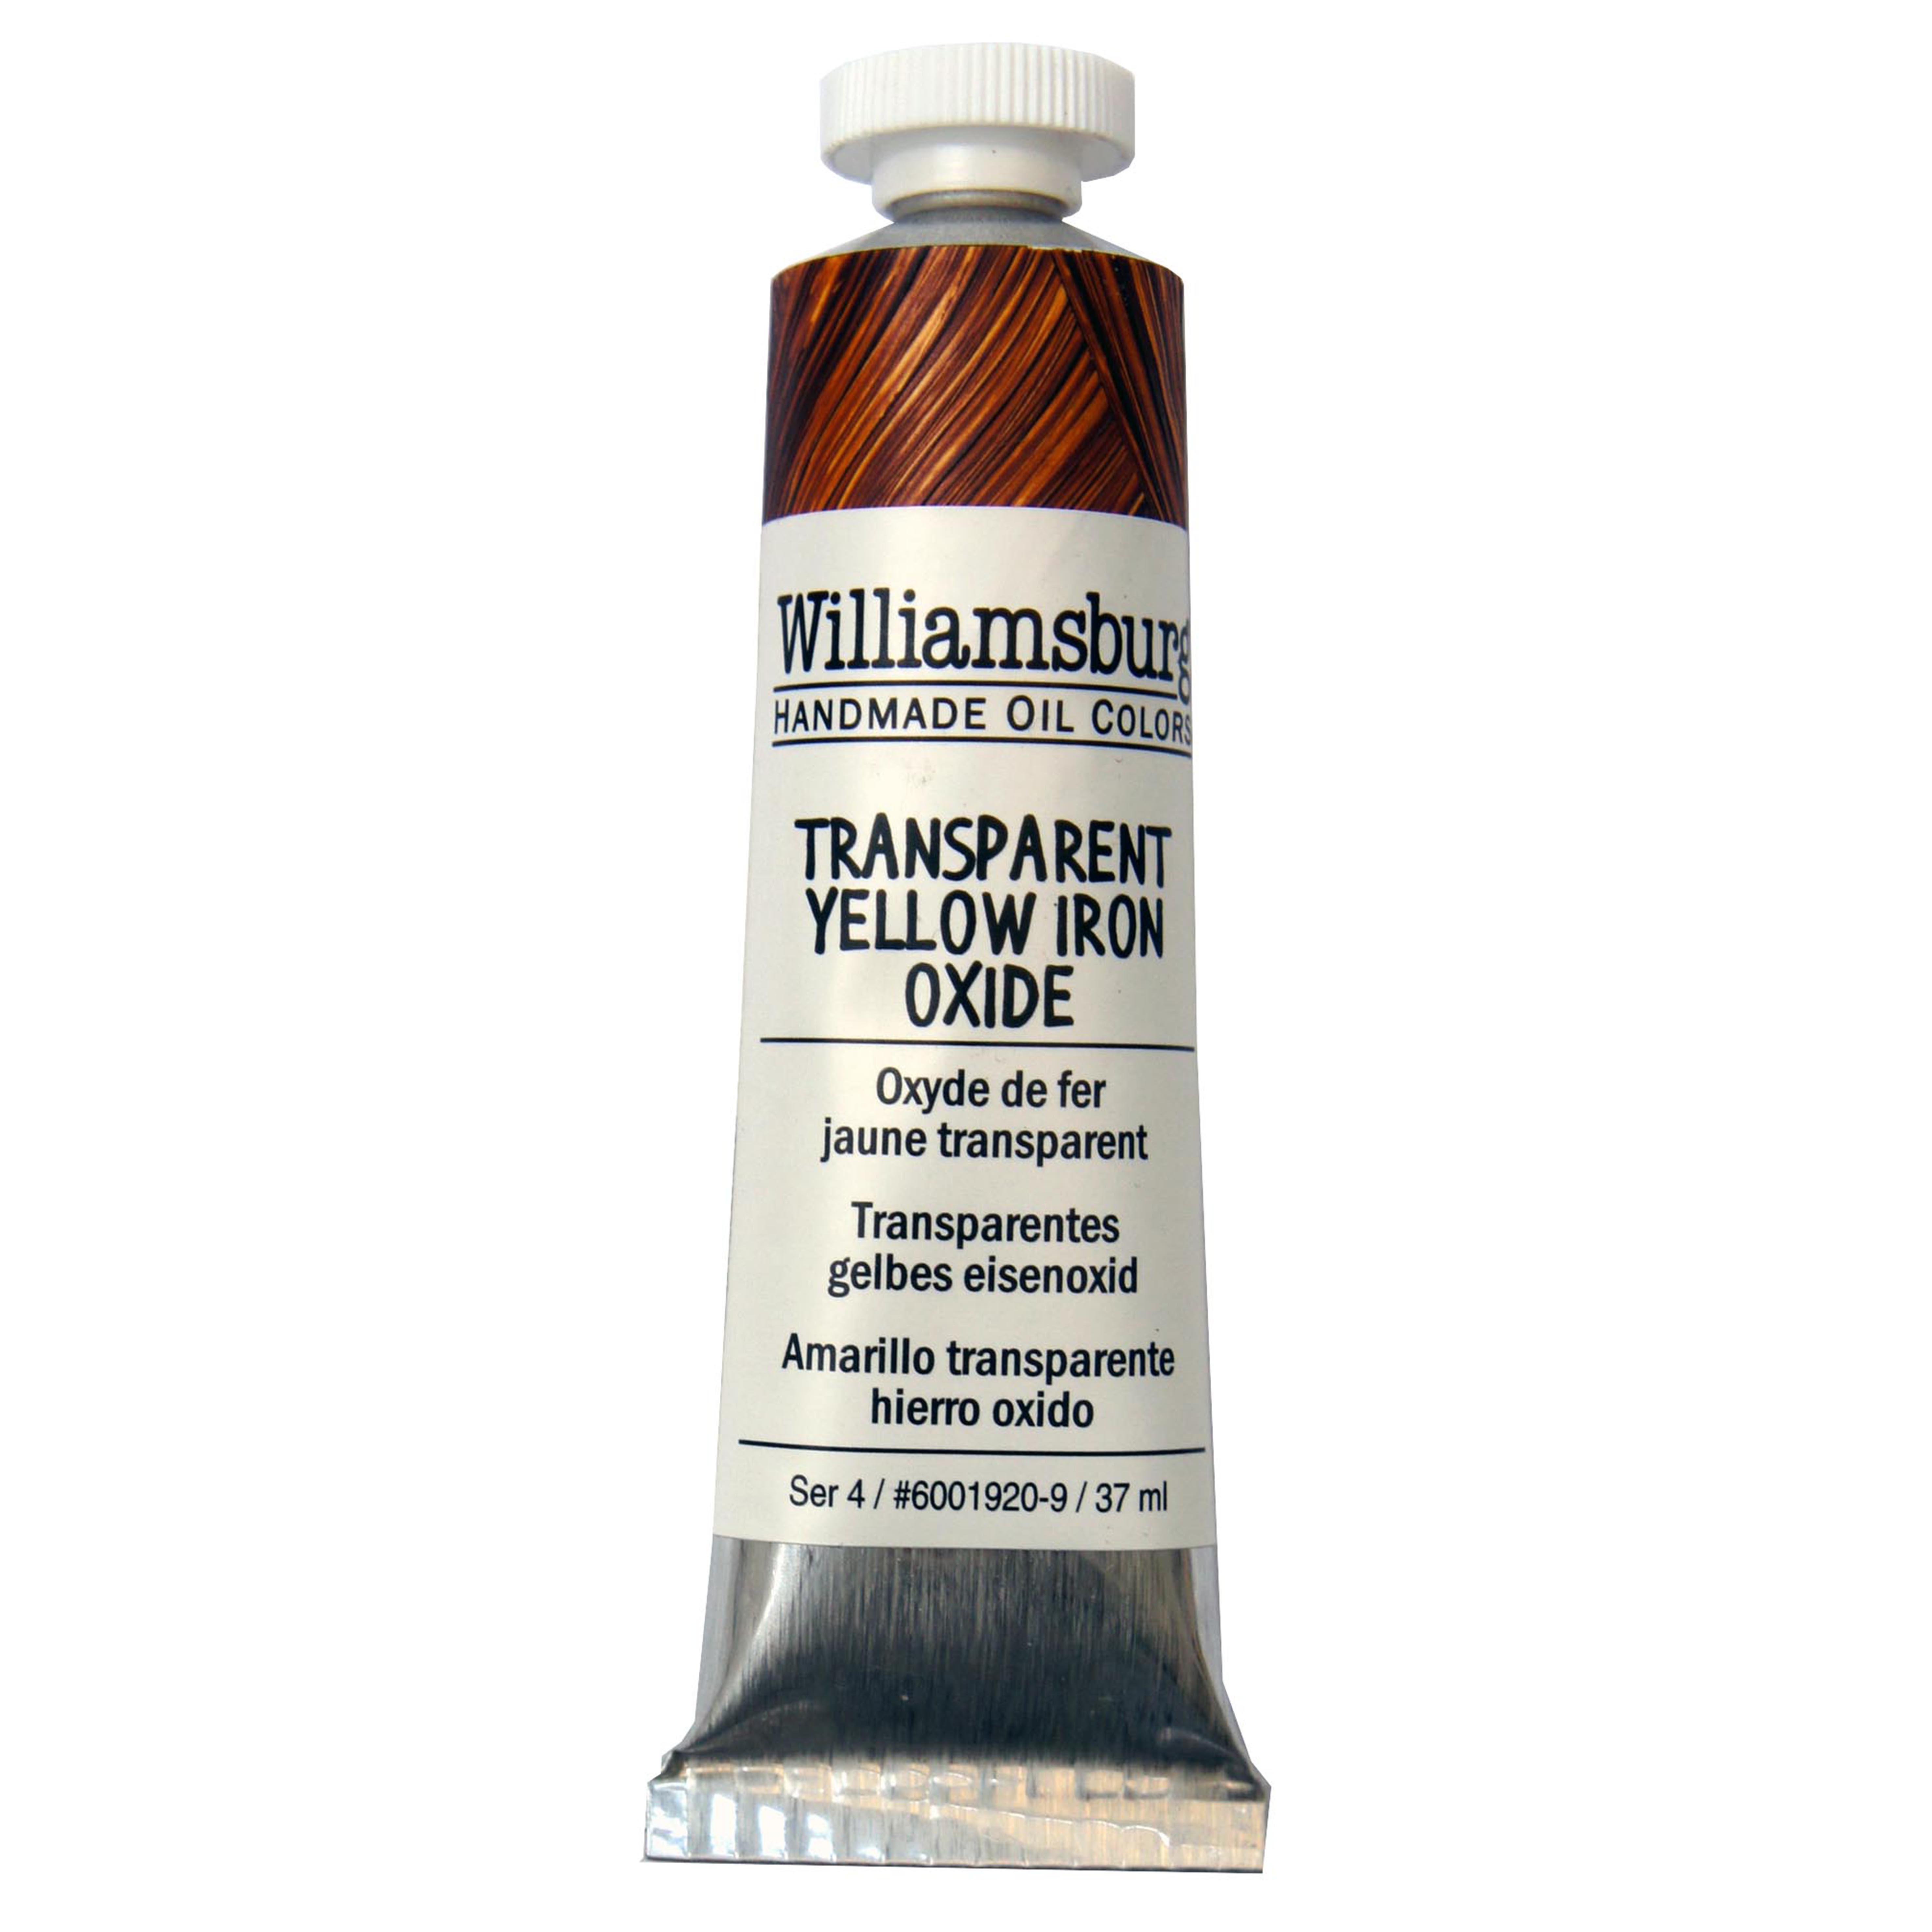 williamsburg transparent yellow iron oxide london art shop buy